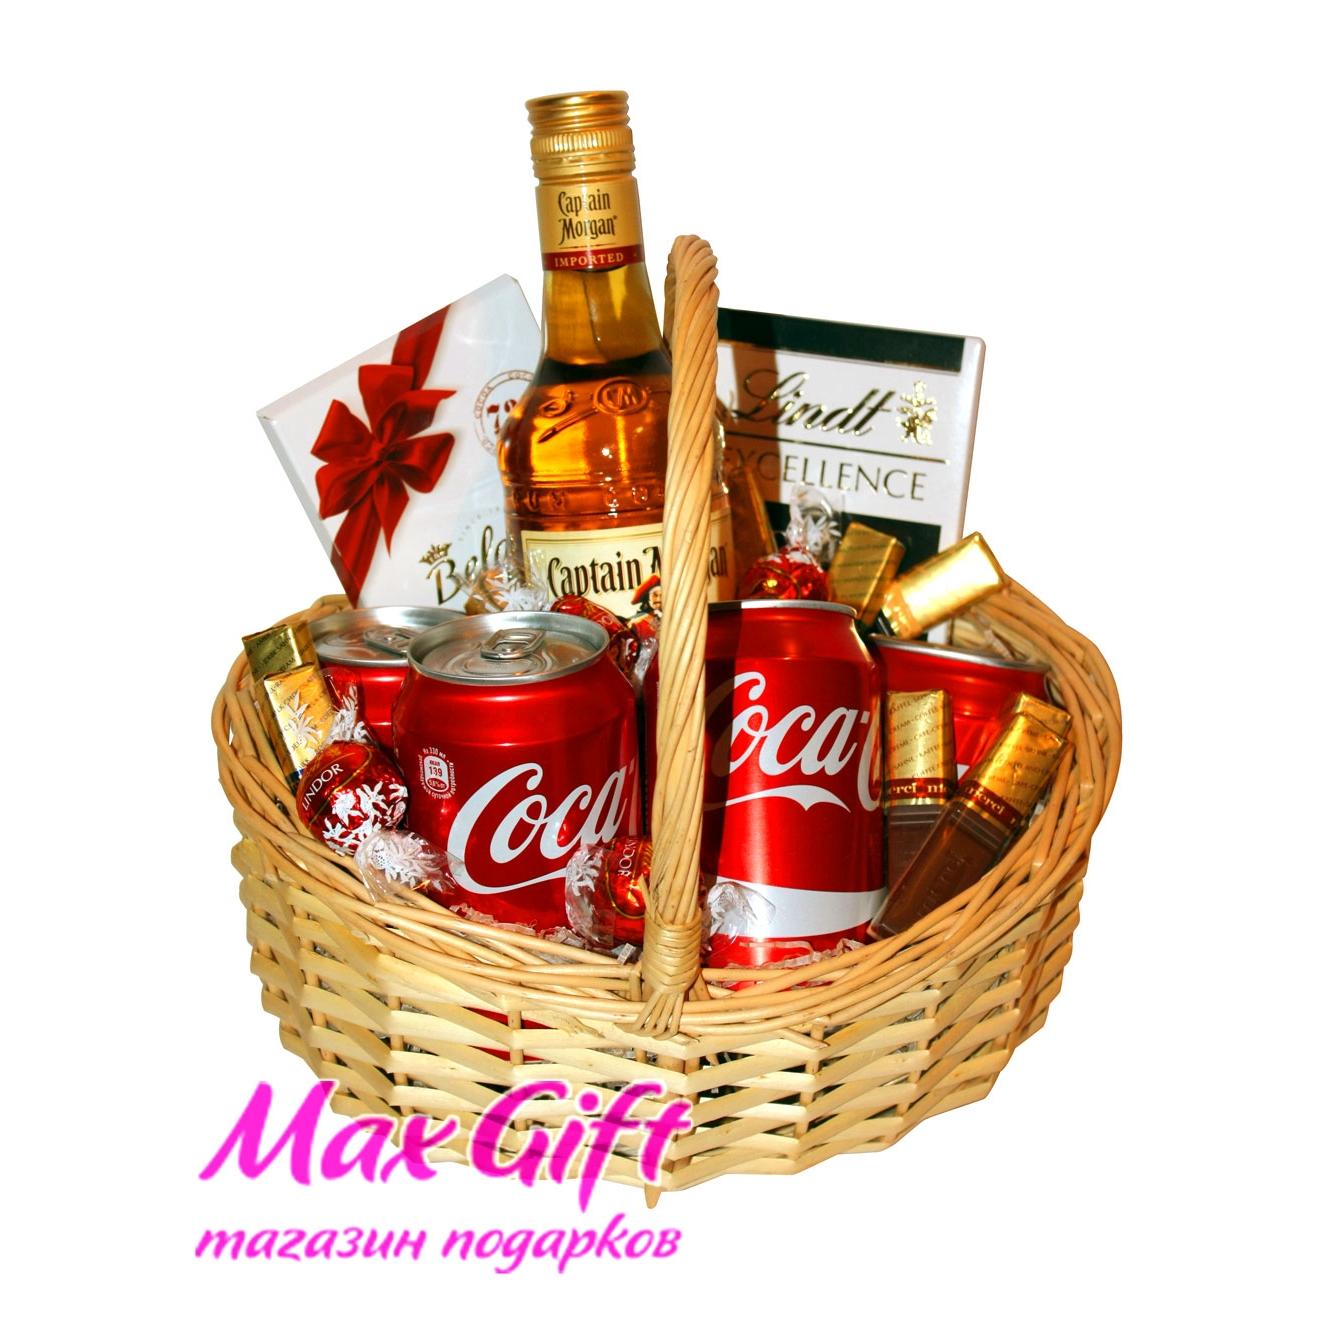 Корзина с алкоголем в подарок мужчине 65